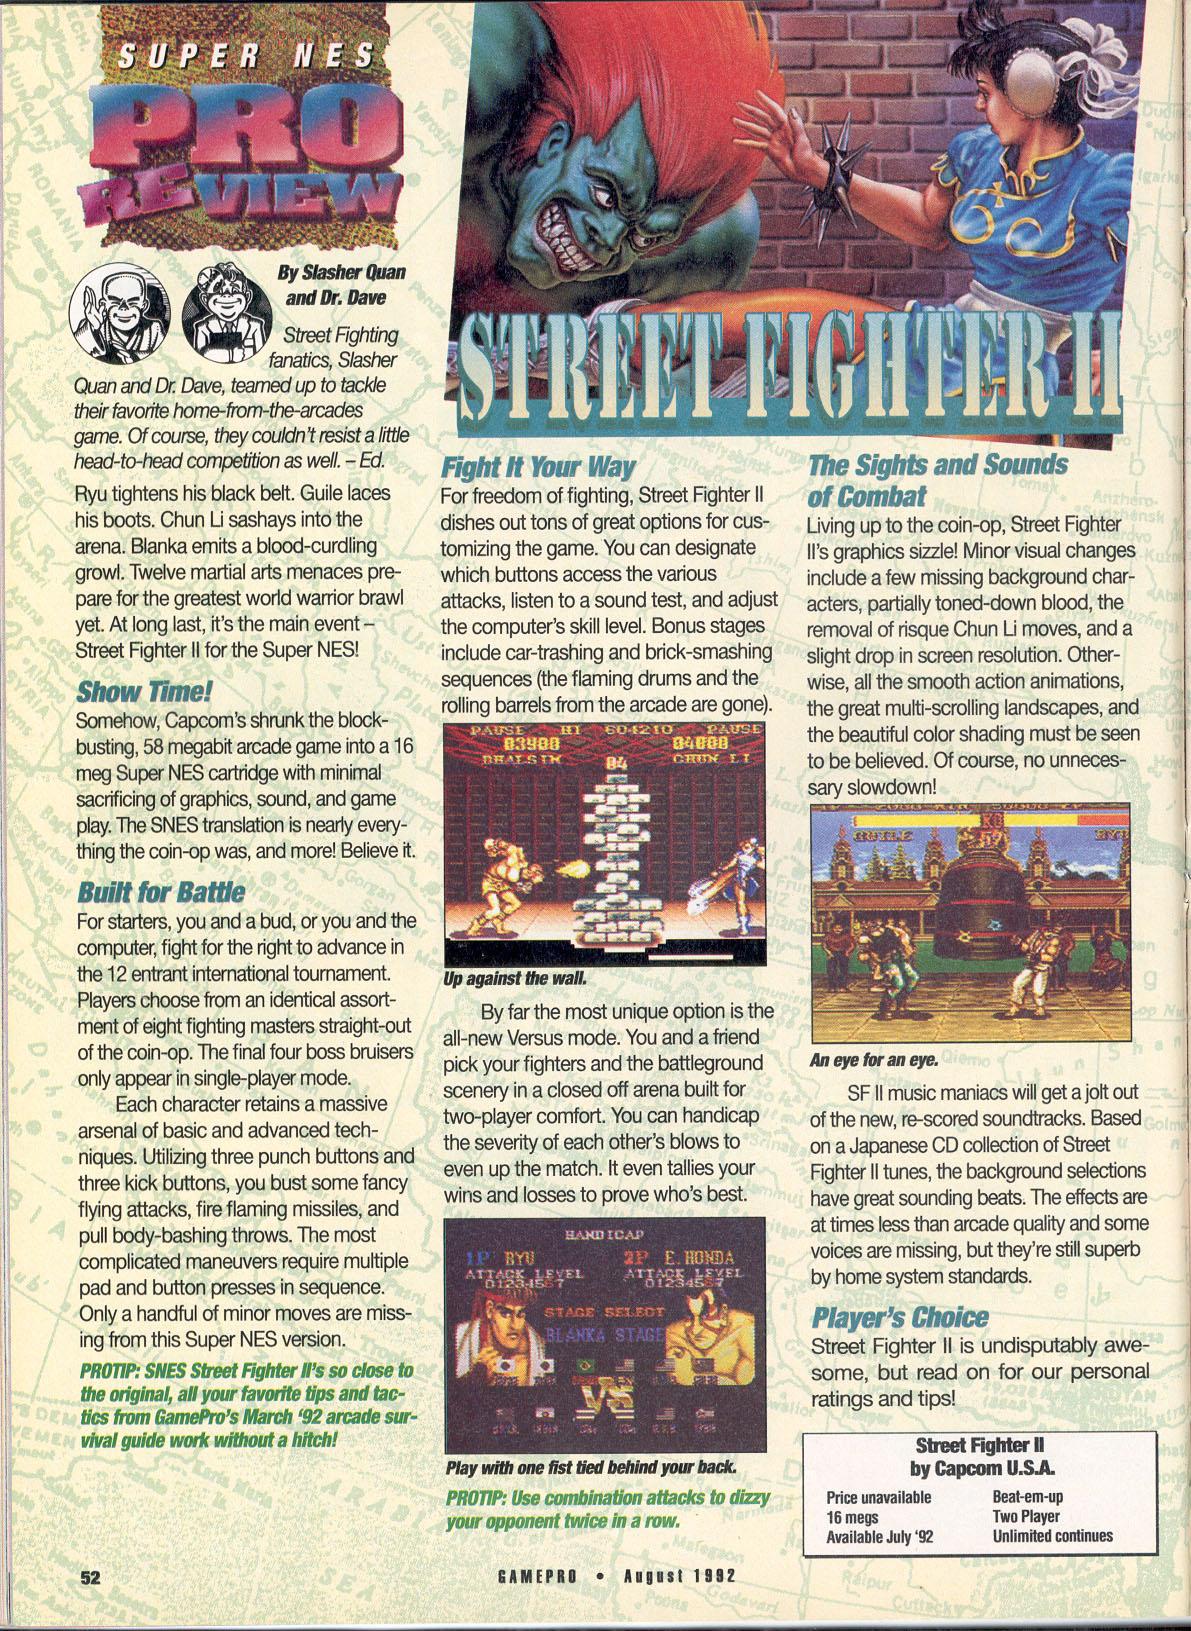 Street Fighter II Coverage 1992-1993   www gamepilgrimage com